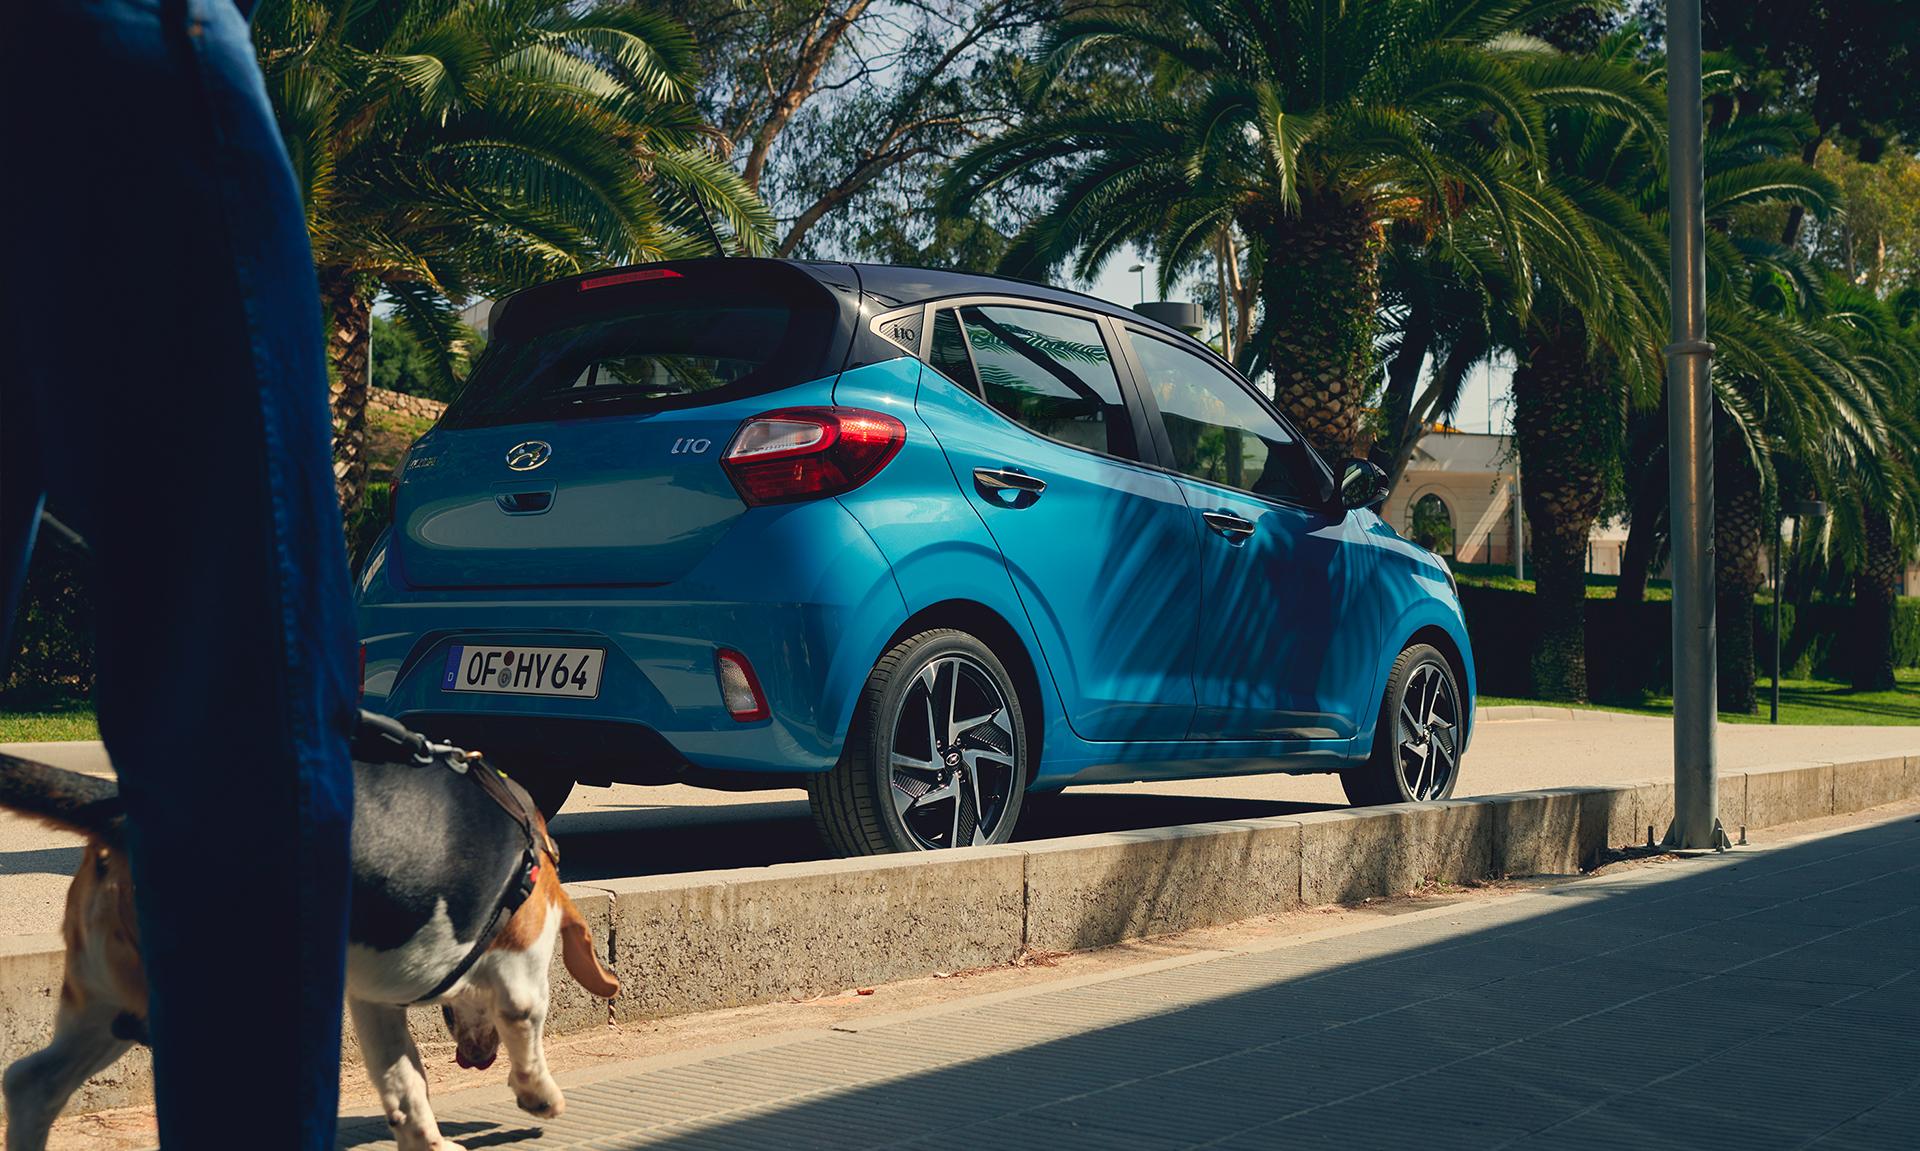 Nuova Hyundai i10 - Pollinauto Concessionaria Trapani